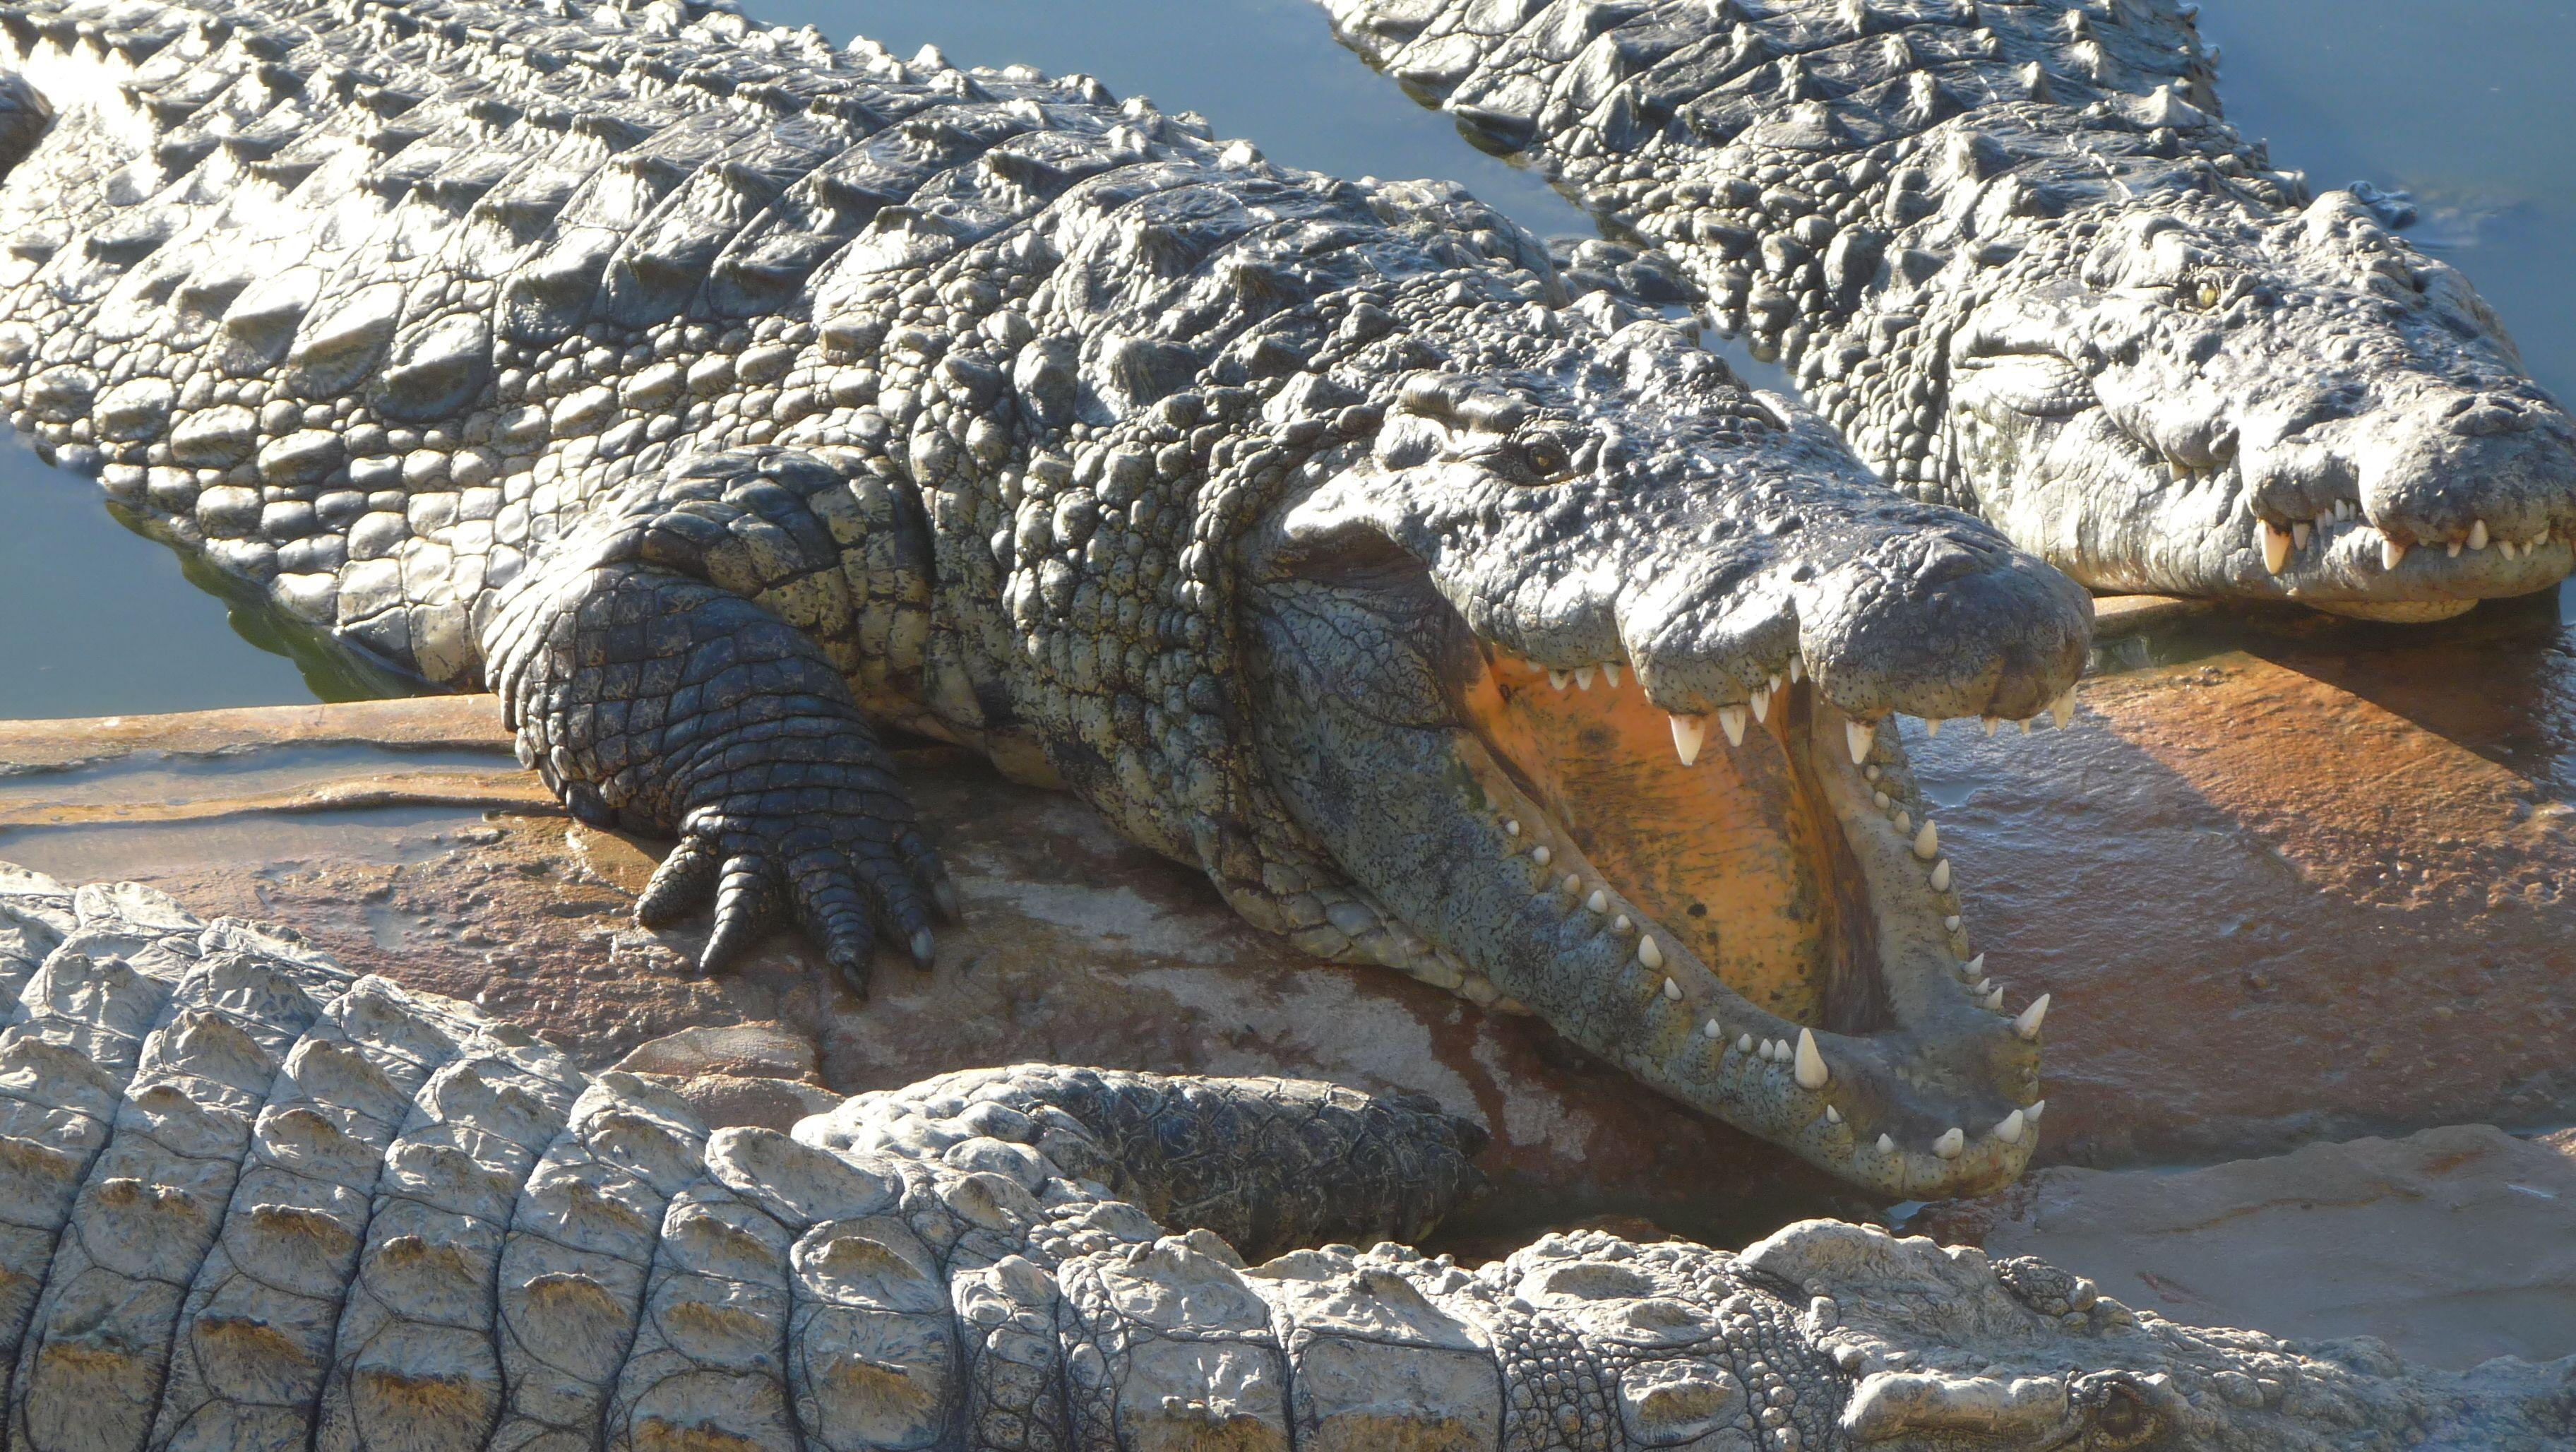 Alligatore trascina in acqua bimbo